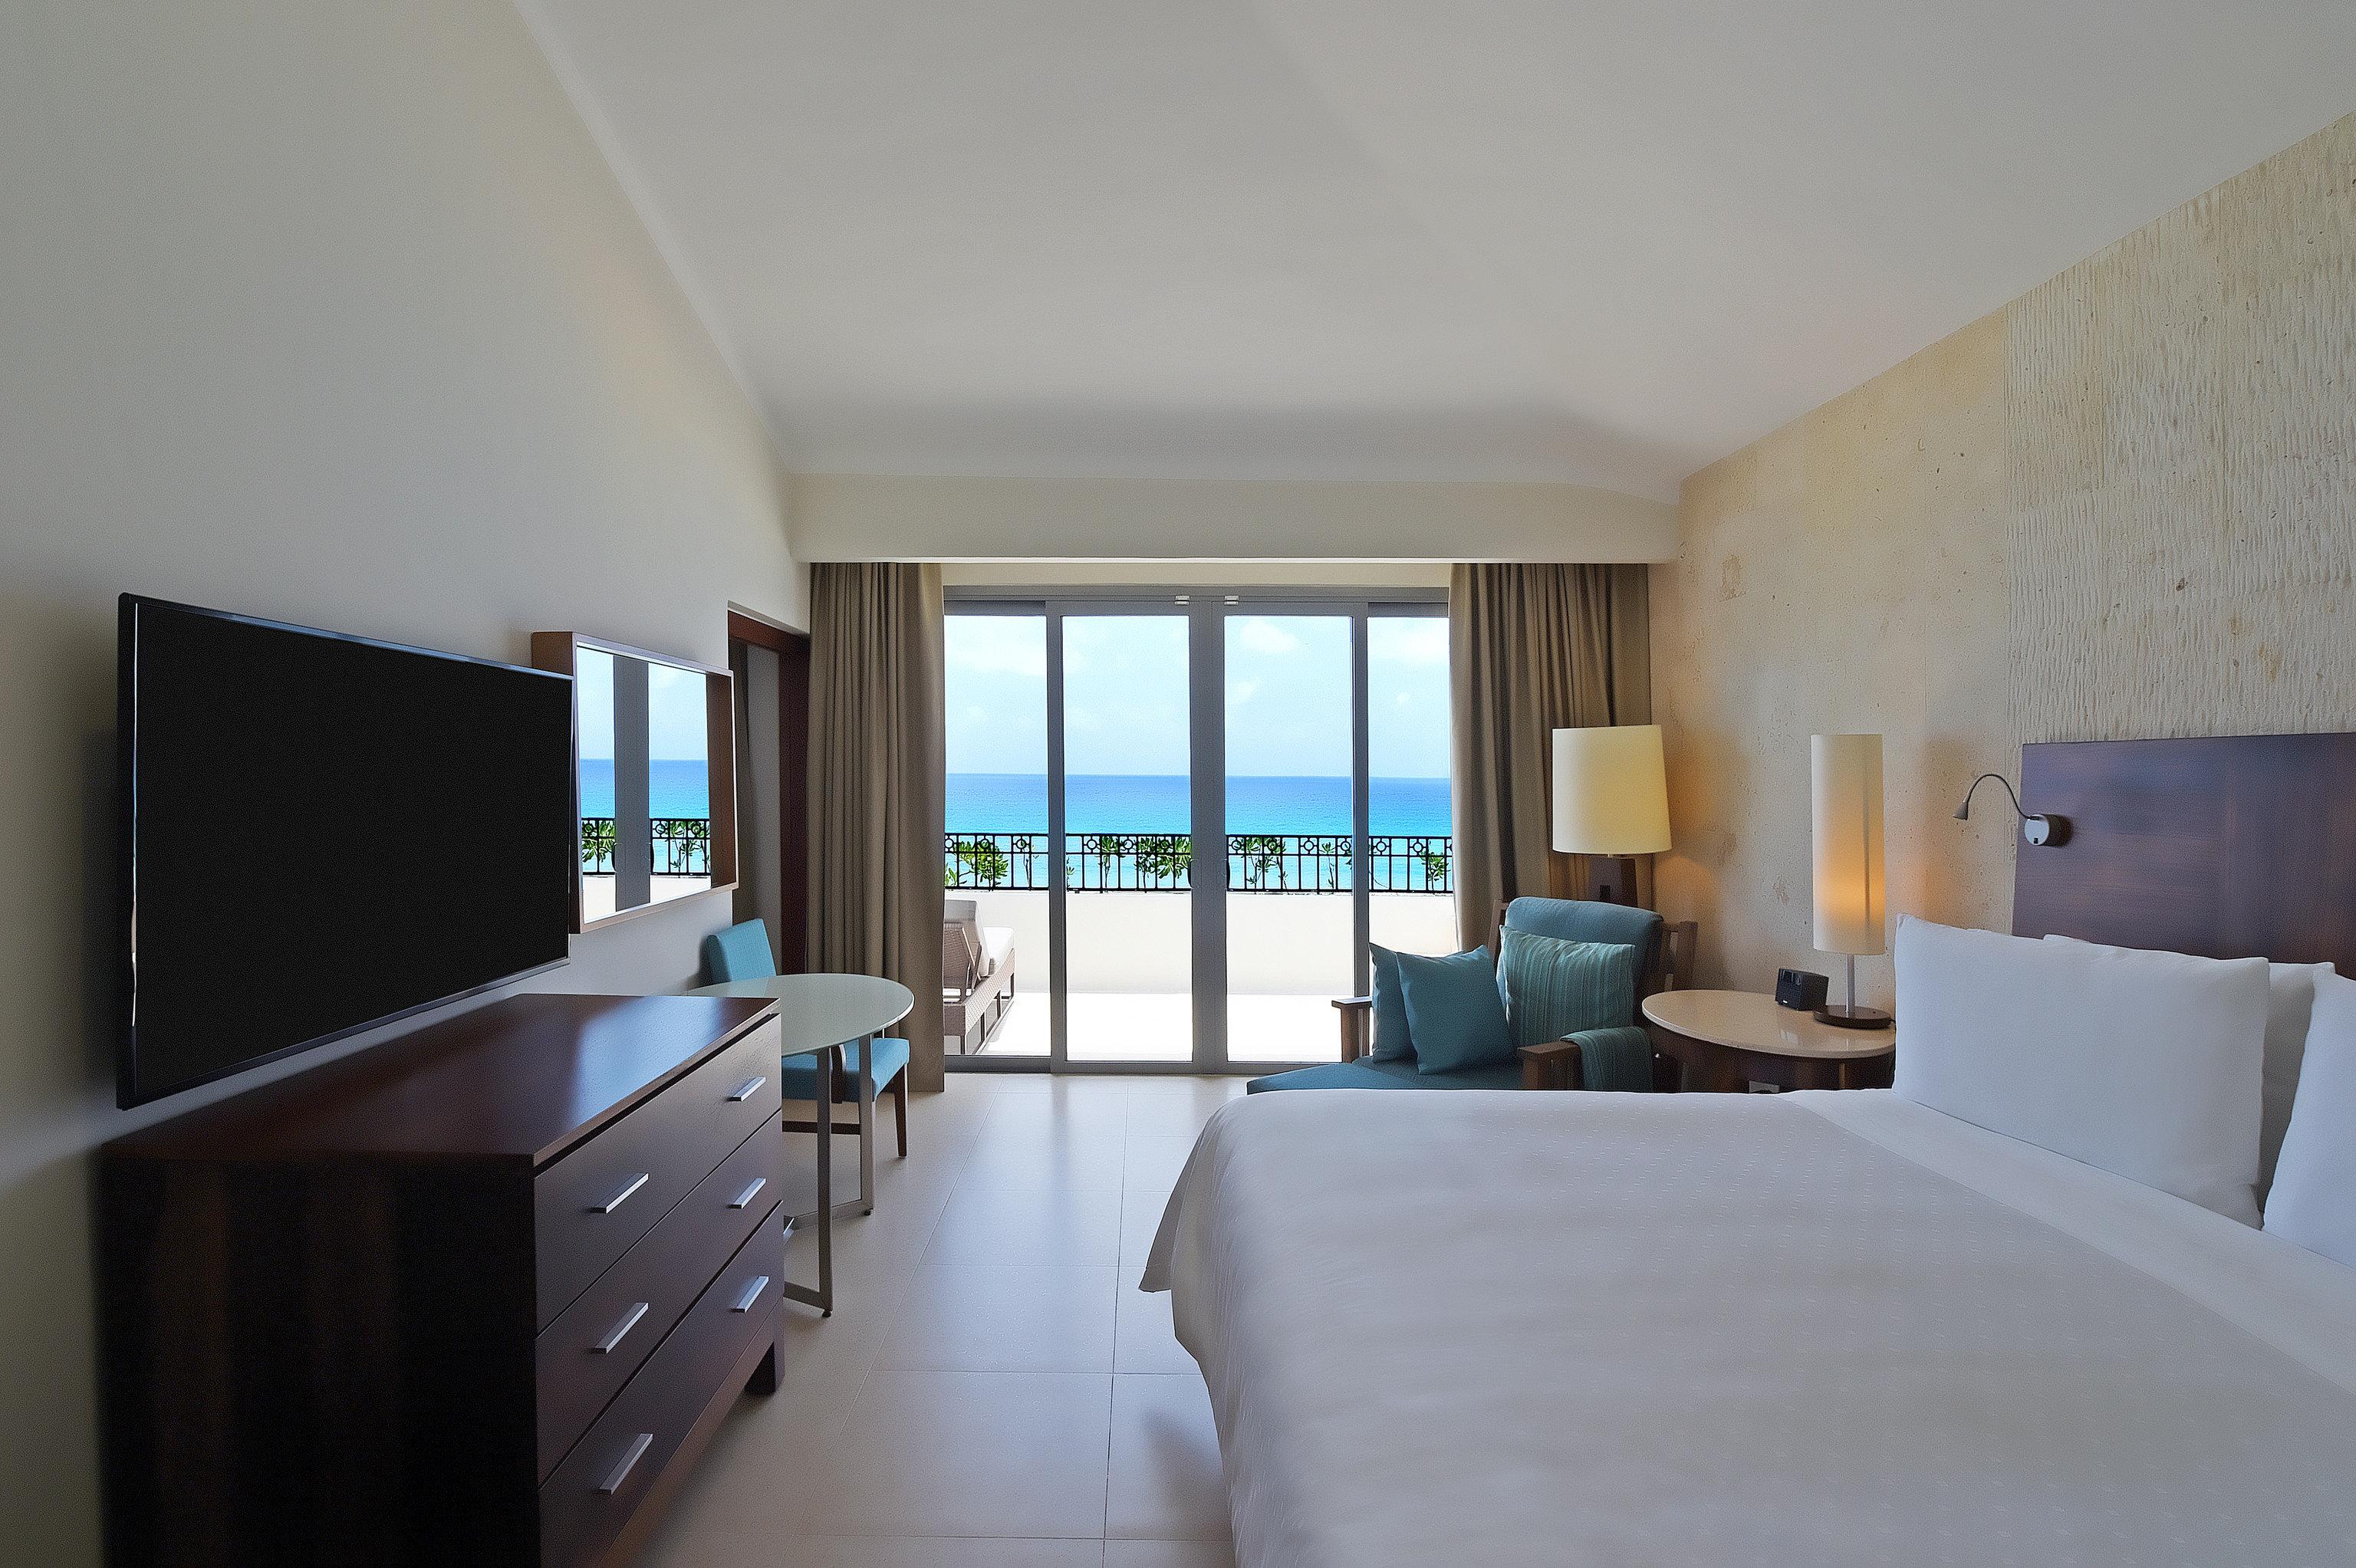 Bedroom Suite white penthouse apartment interior designer daylighting